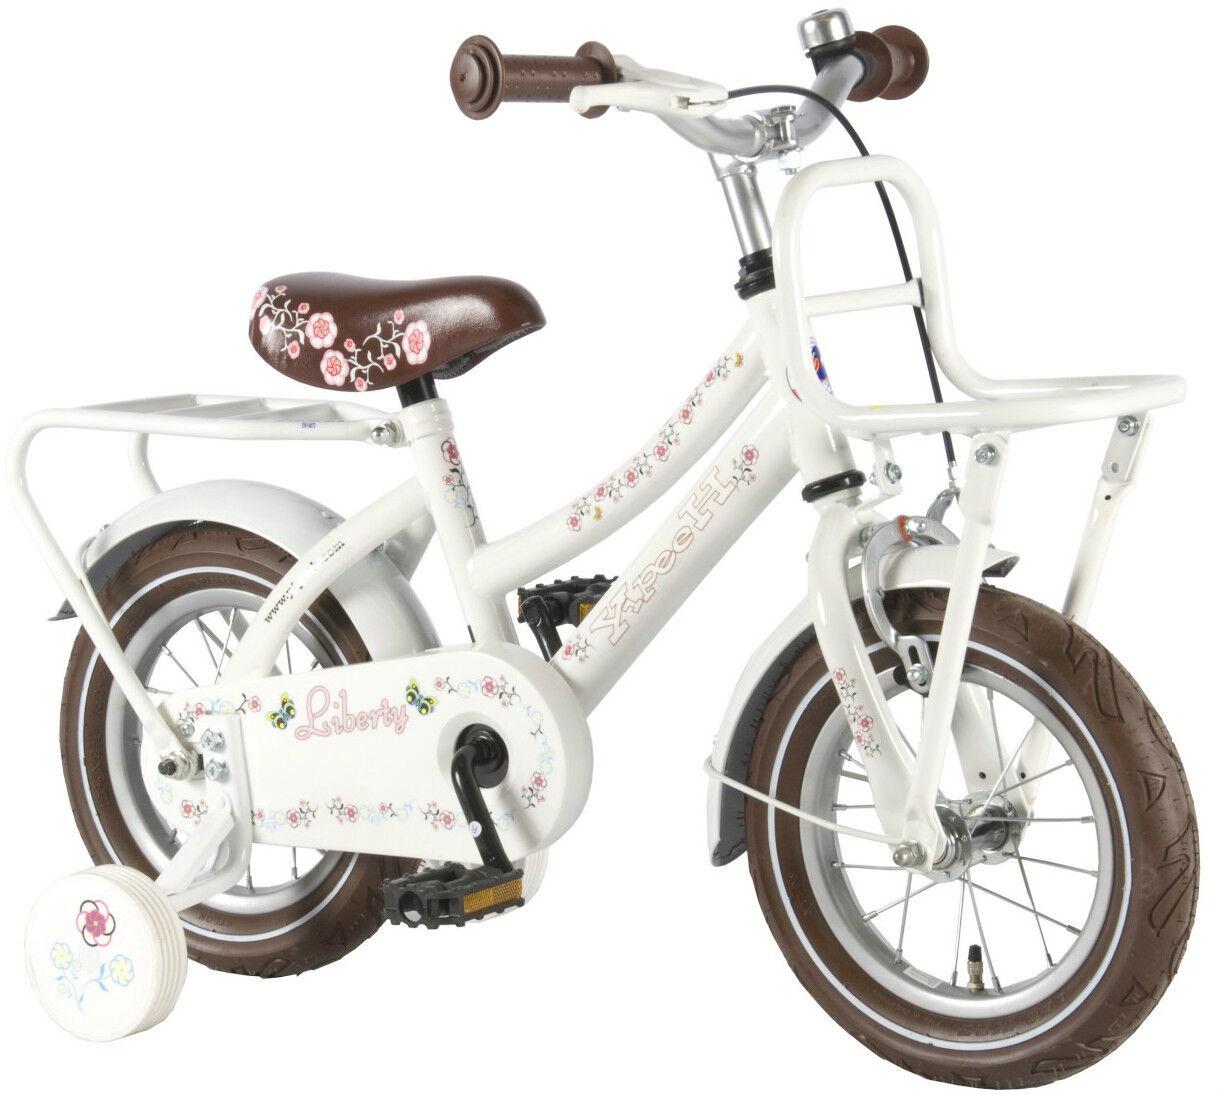 12 Zoll Fahrrad Holland Style Qualitäts Kinderfahrrad mit Stützräder weiss 21228